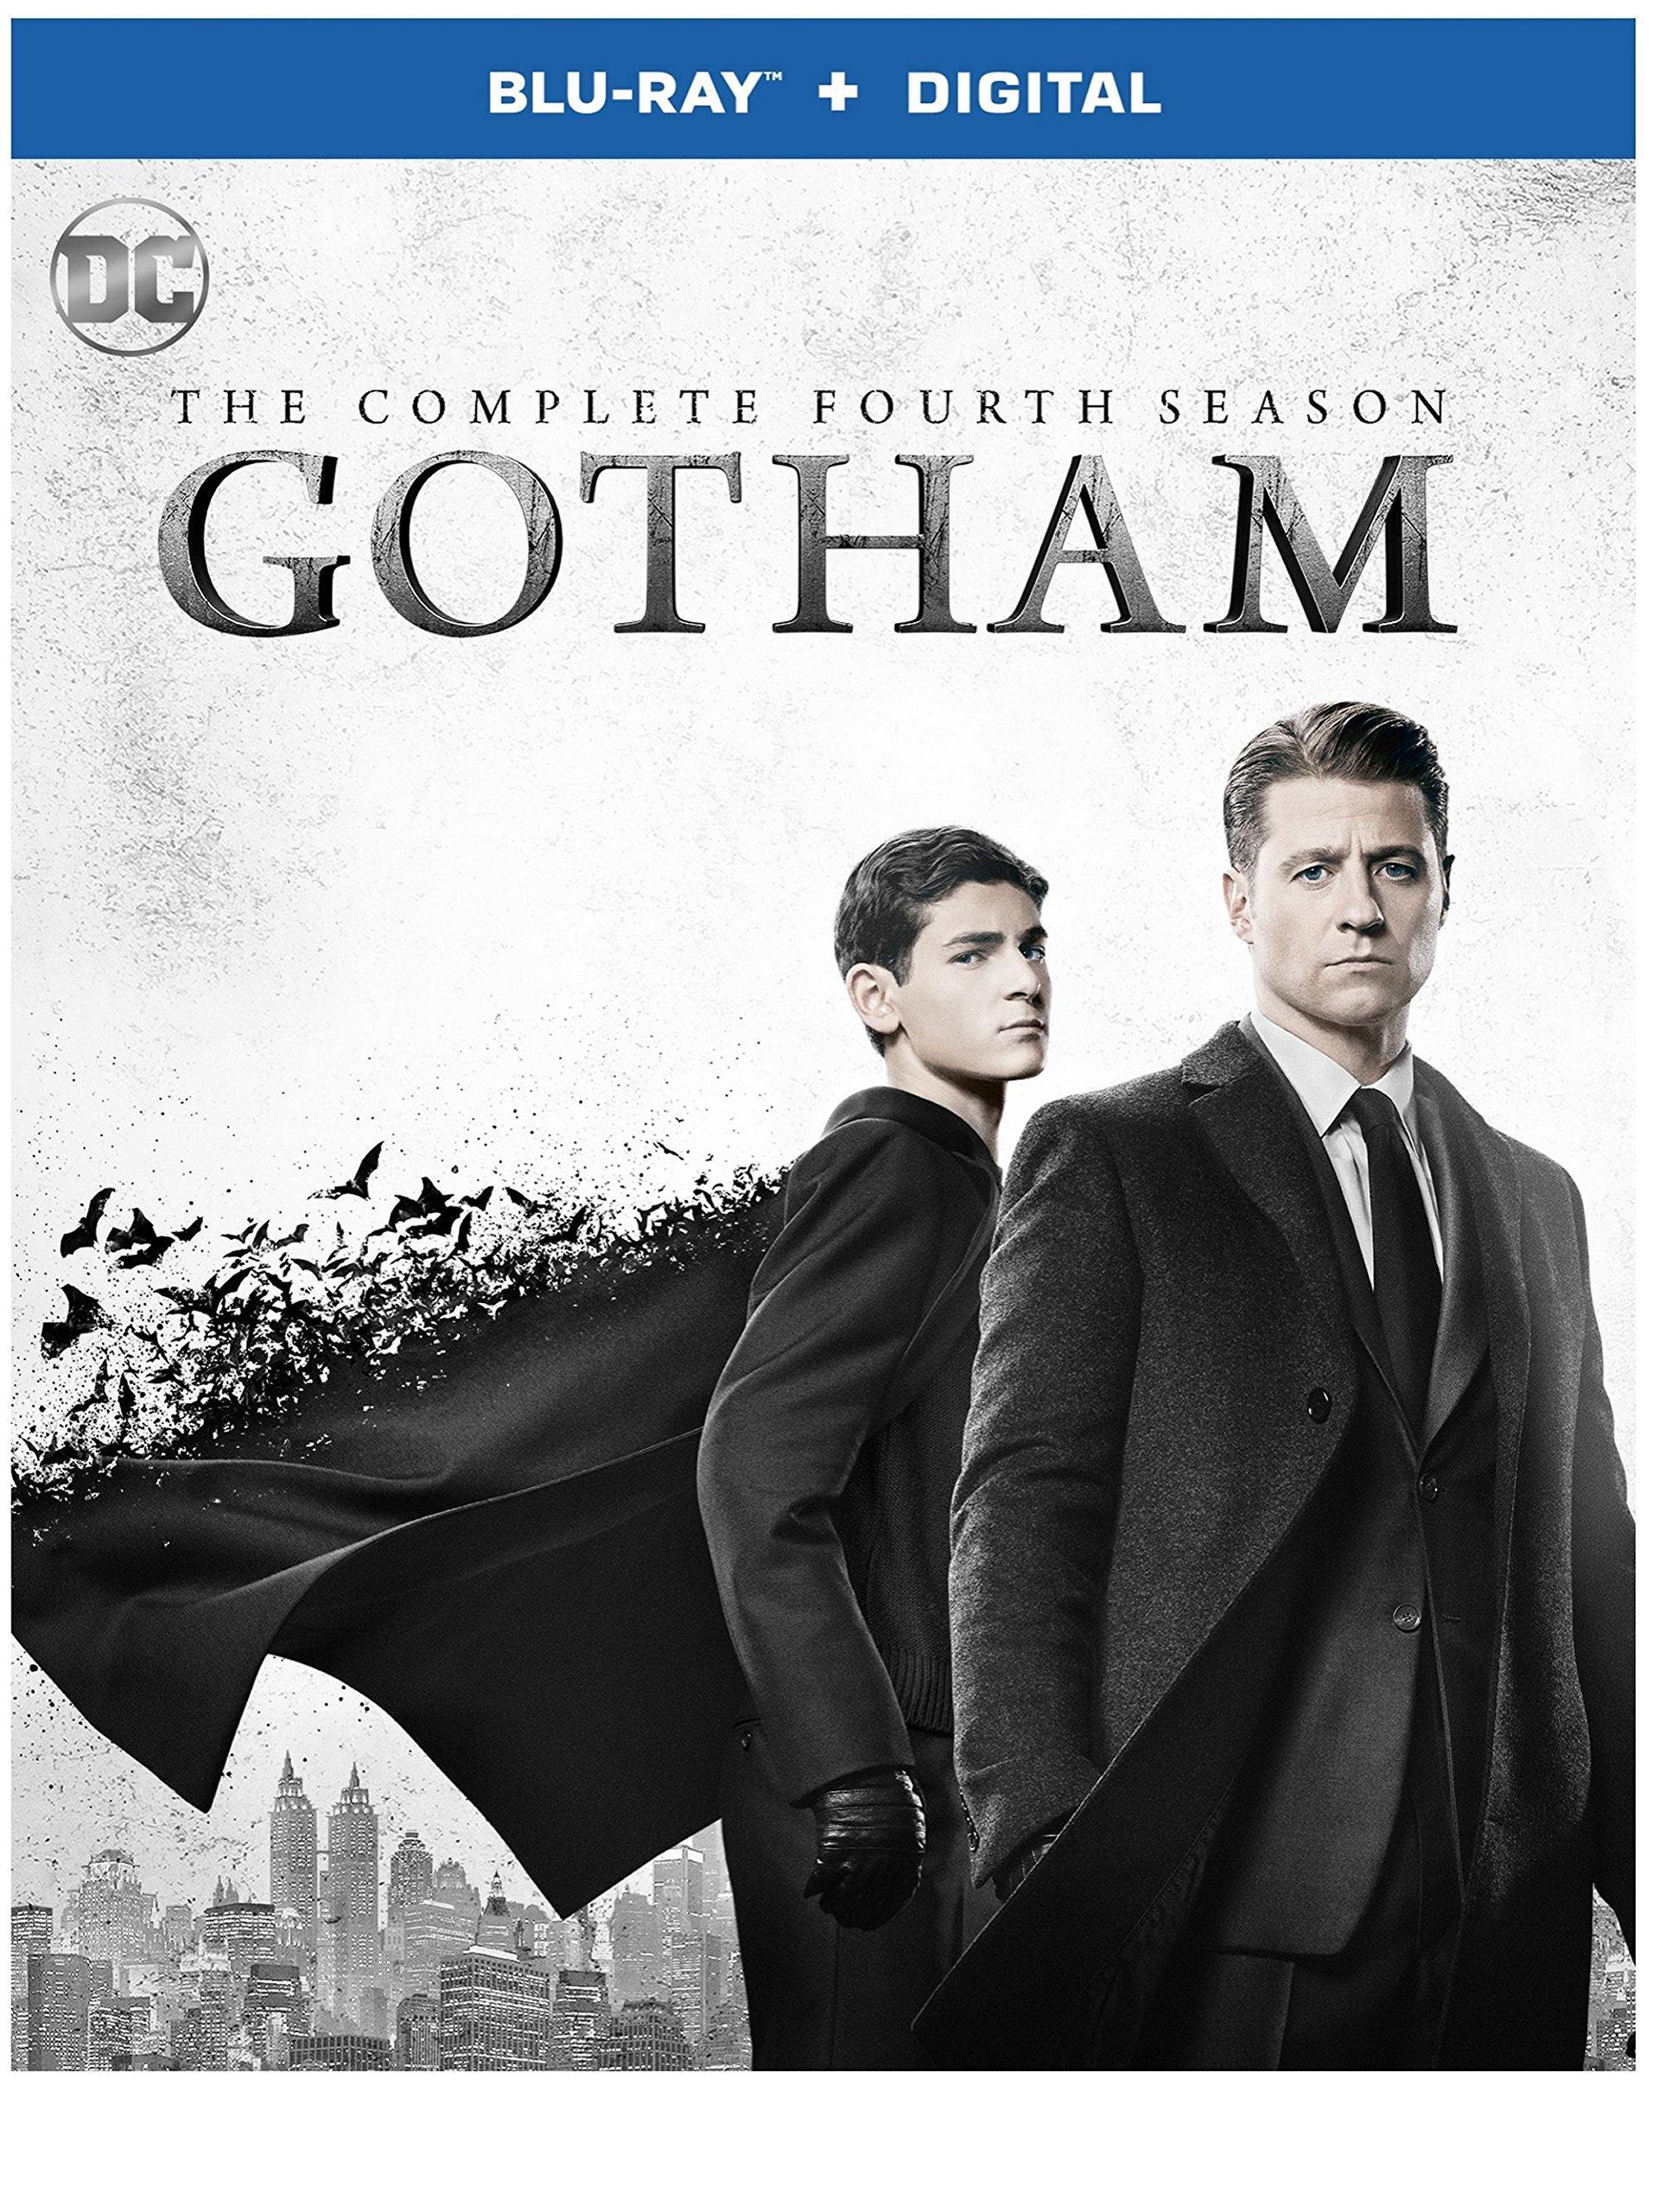 Blu-ray : Gotham: The Complete Fourth Season (dc) (Boxed Set, Digital Copy, 4PC)